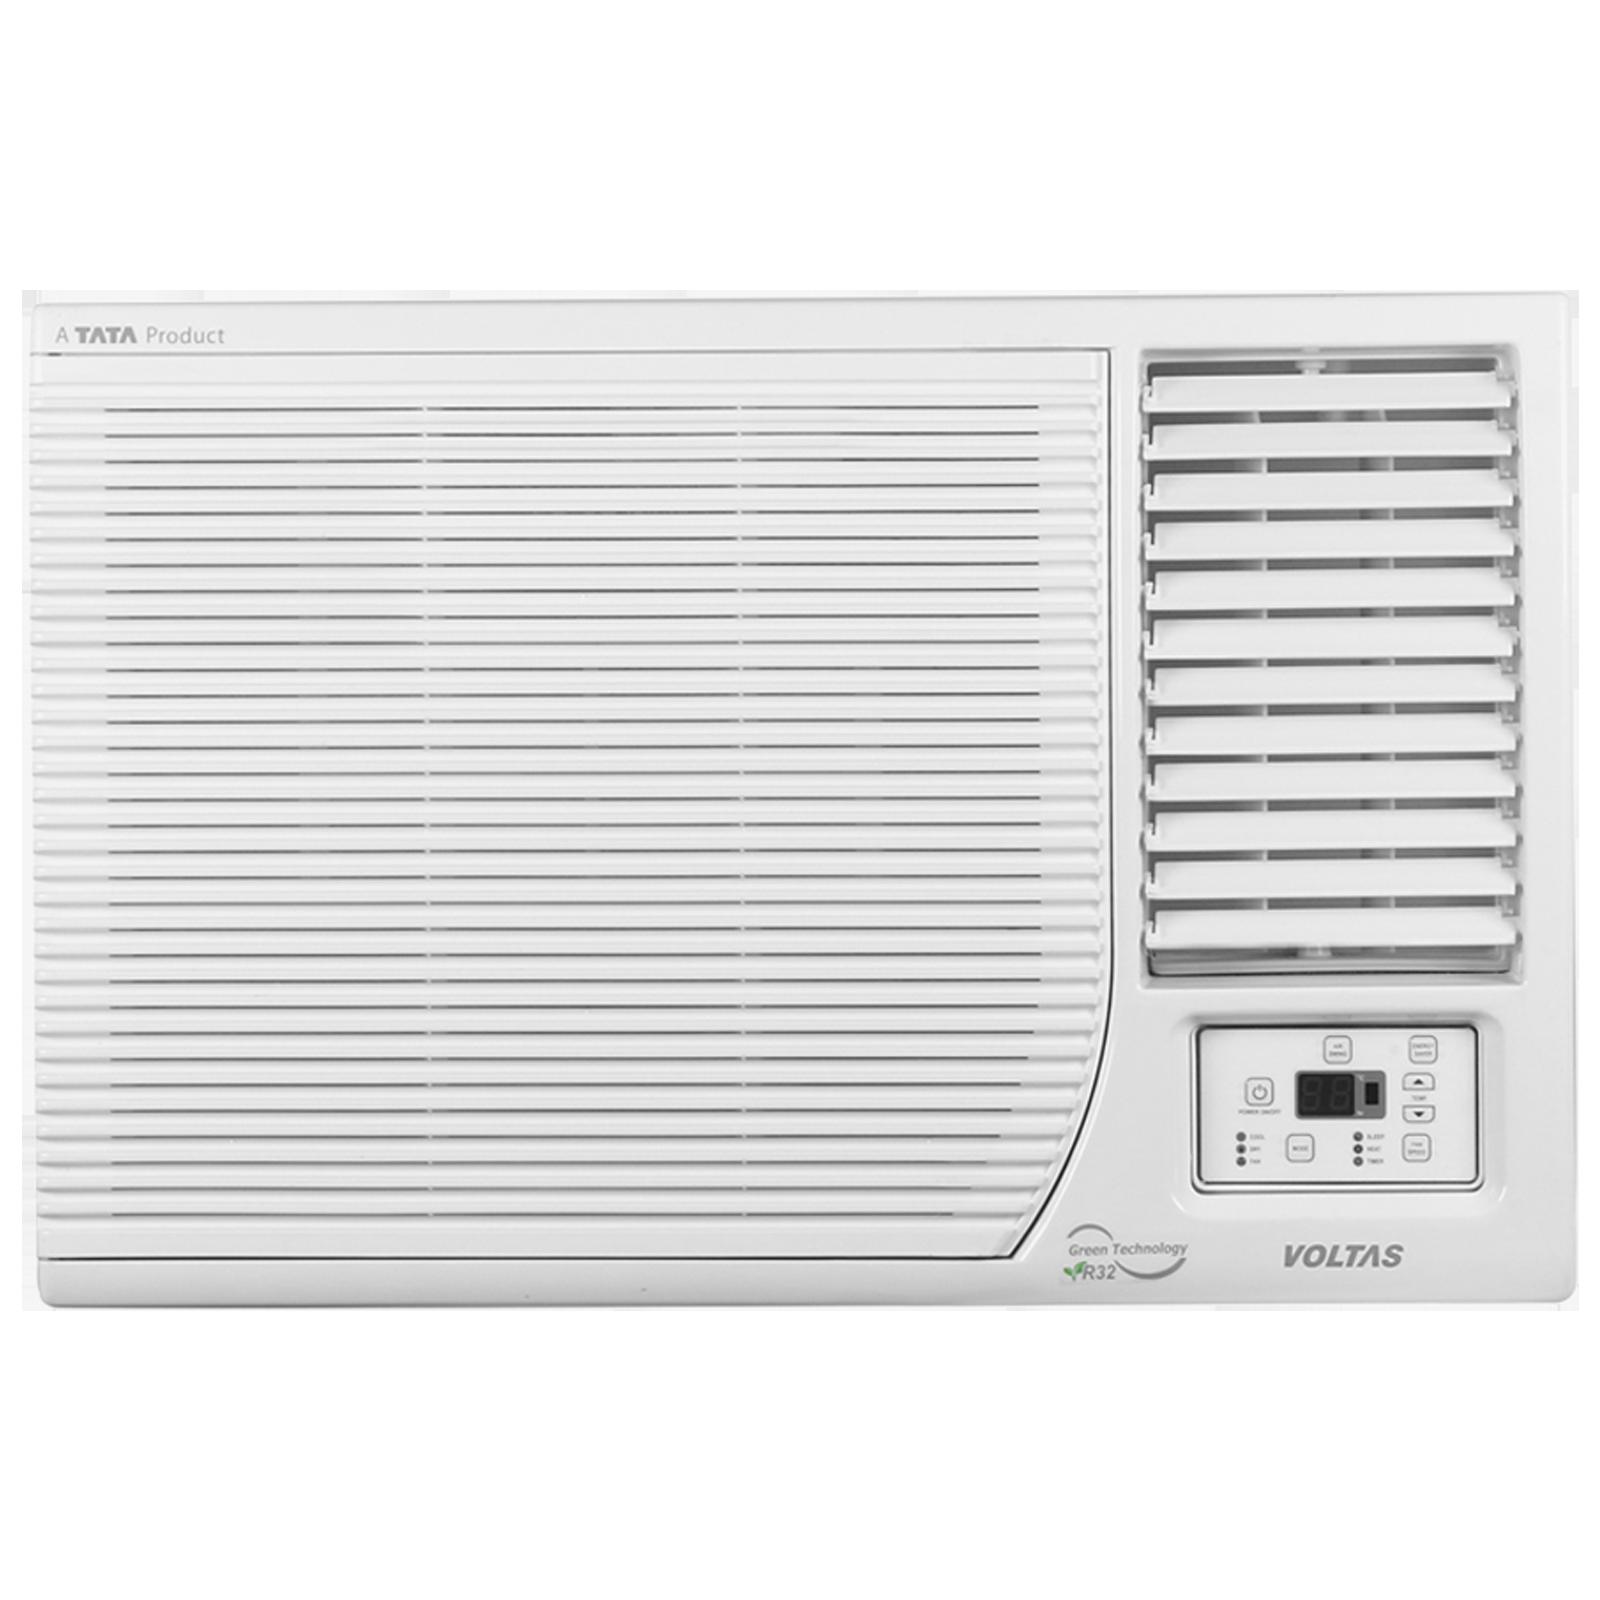 Voltas 1.5 Ton 3 Star Inverter Window AC (Hot and Cold, Copper Condenser, 18H DZB, White)_1